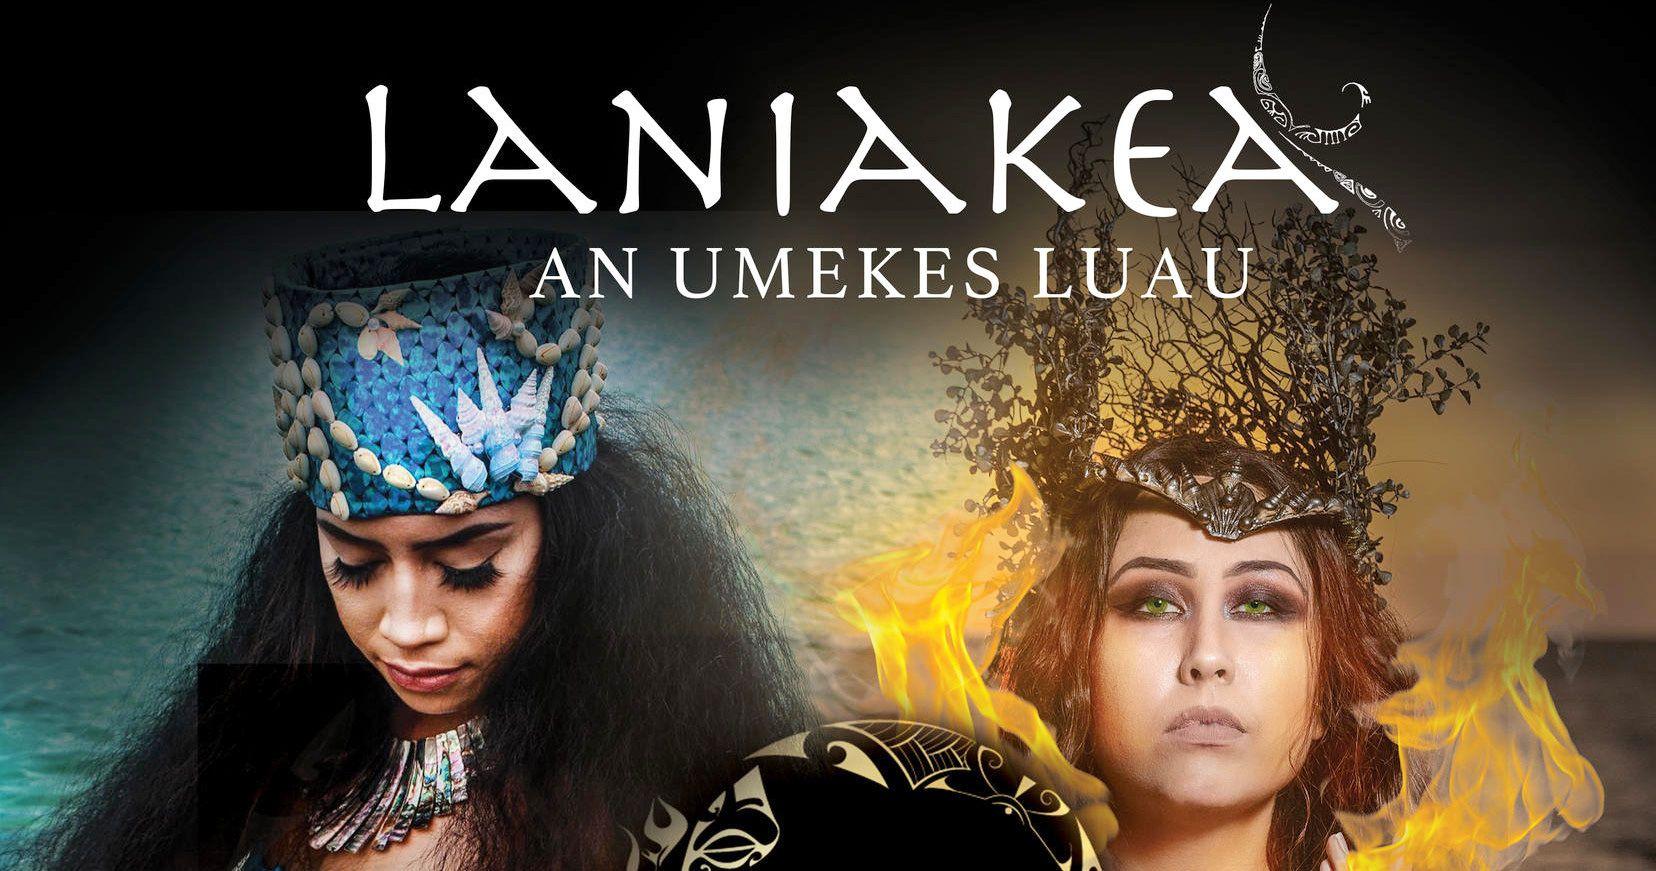 Oahi Entertainment Laniakea an Umekes Luau